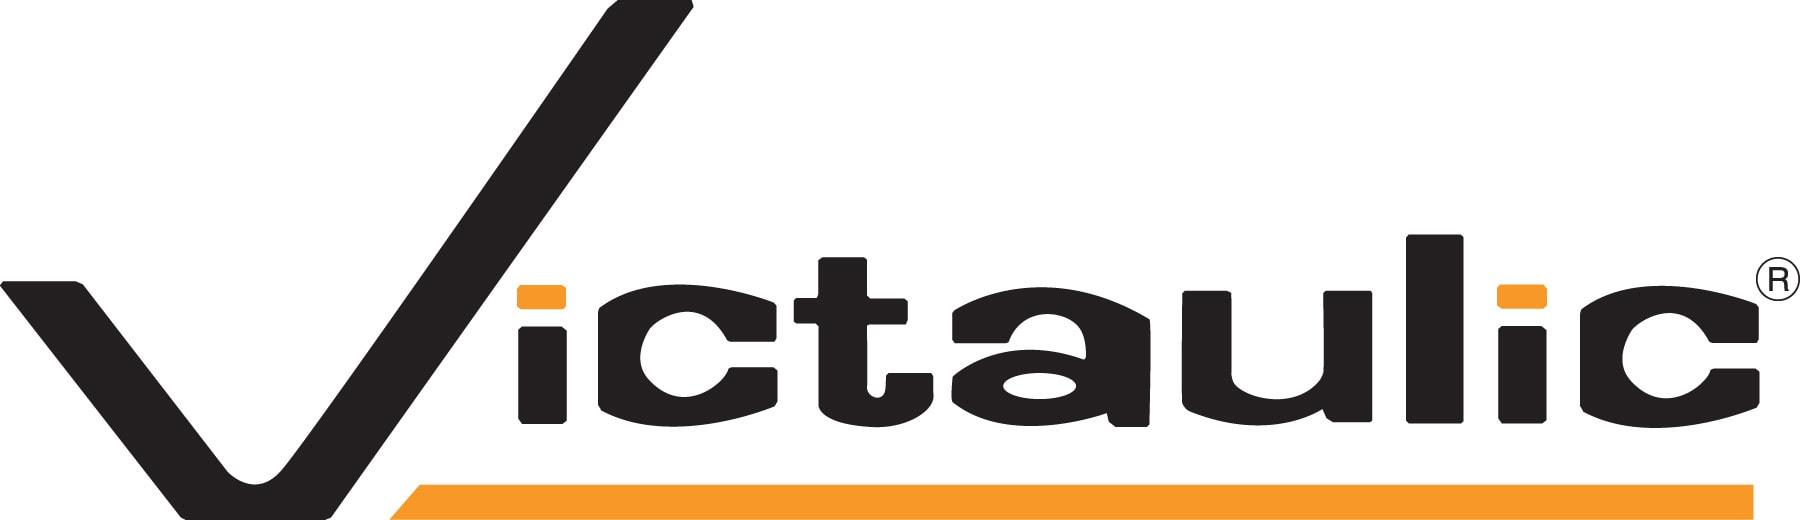 Boplan client: Victaulic logo